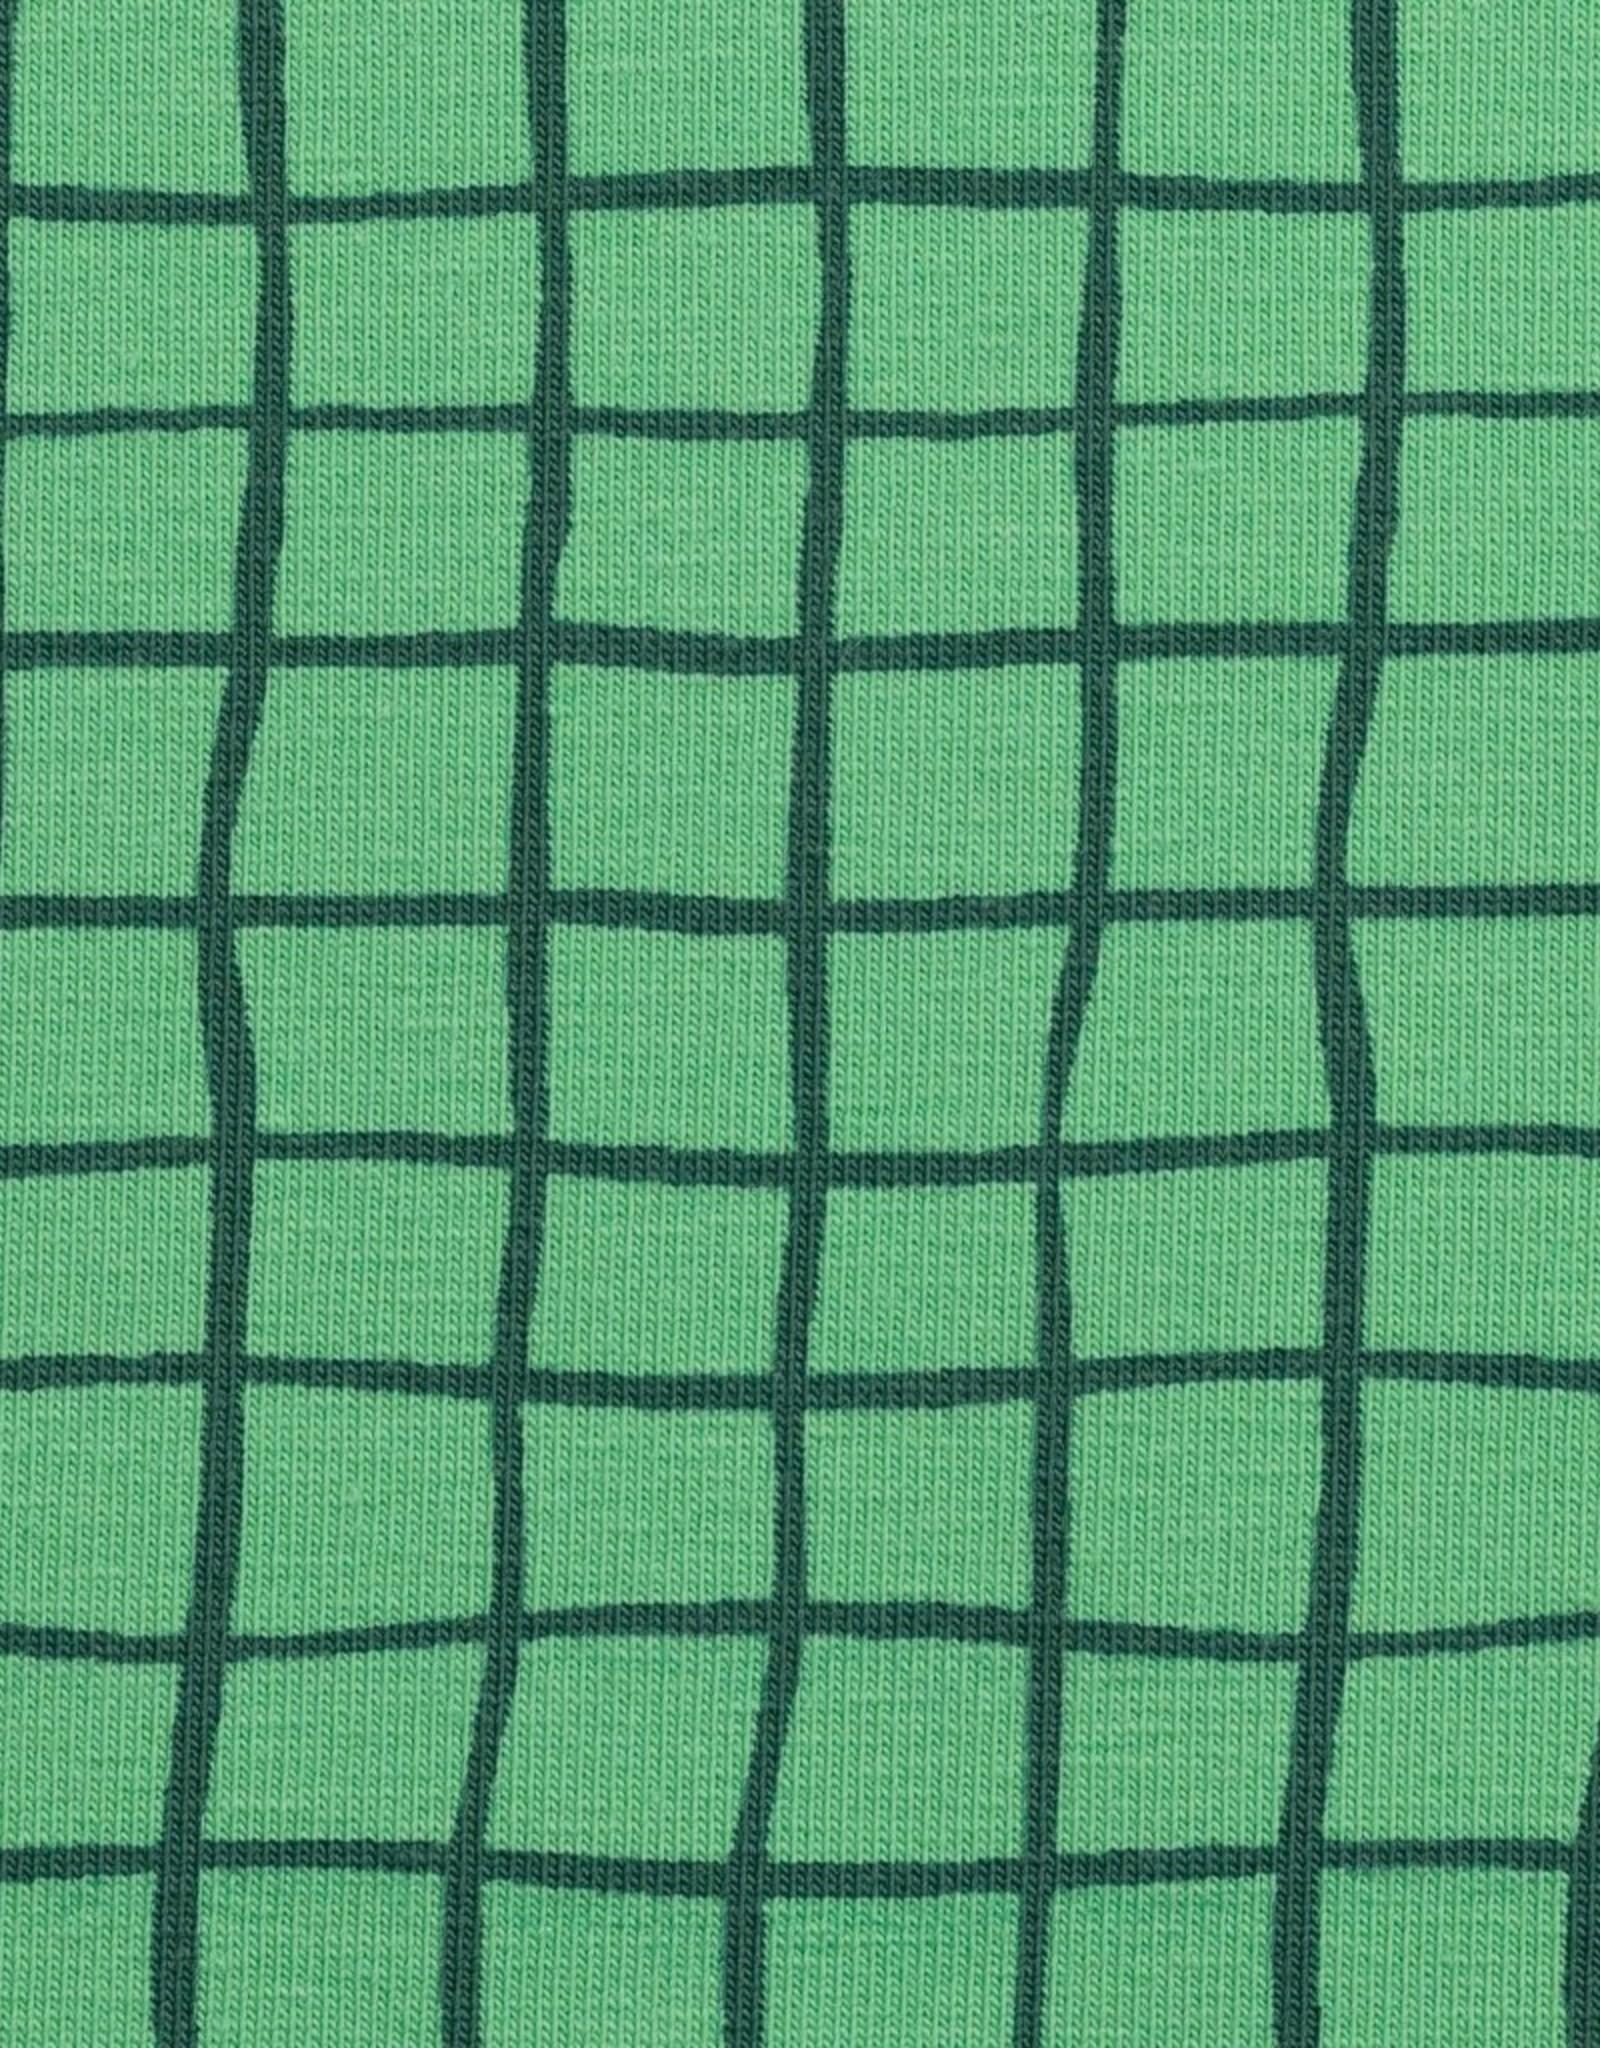 Tricot groen geruit